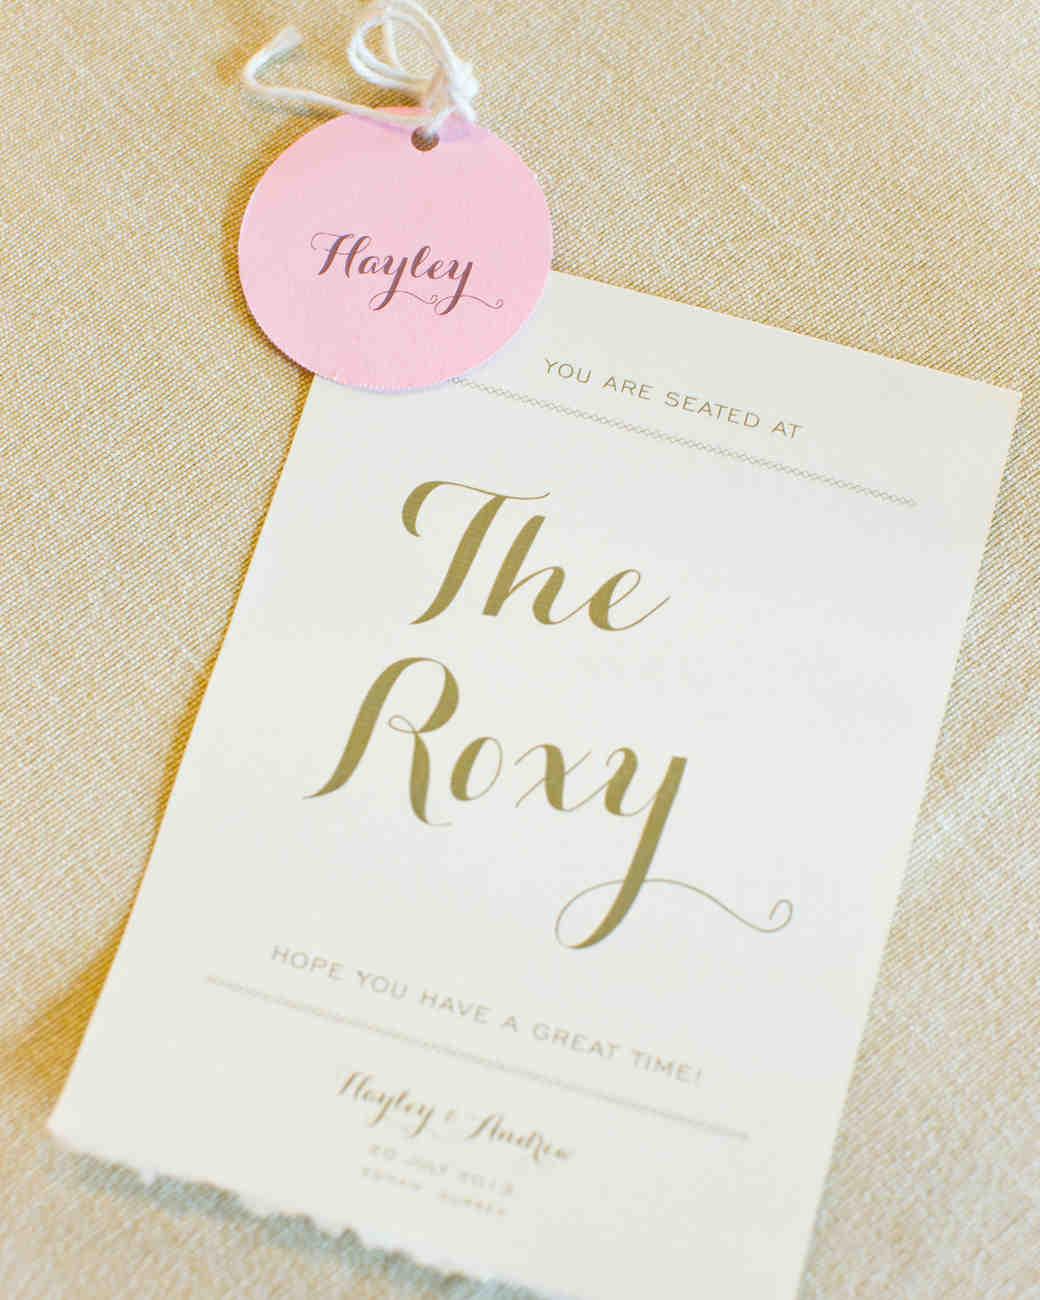 hayley-andrew-wedding-scroll2-0714.jpg